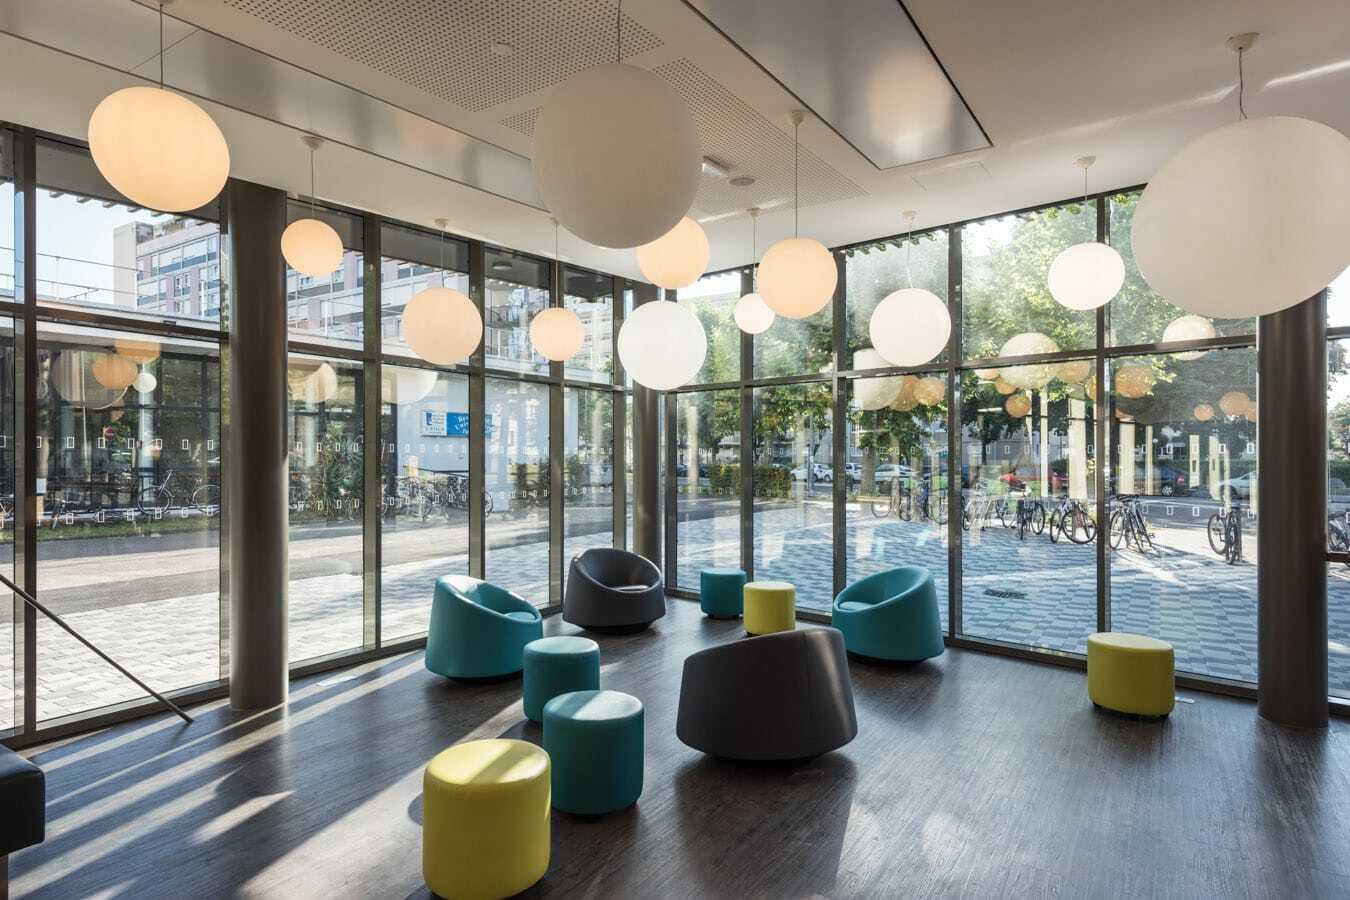 restaurant universitaire paul appell strasbourg un projet weber et keiling. Black Bedroom Furniture Sets. Home Design Ideas